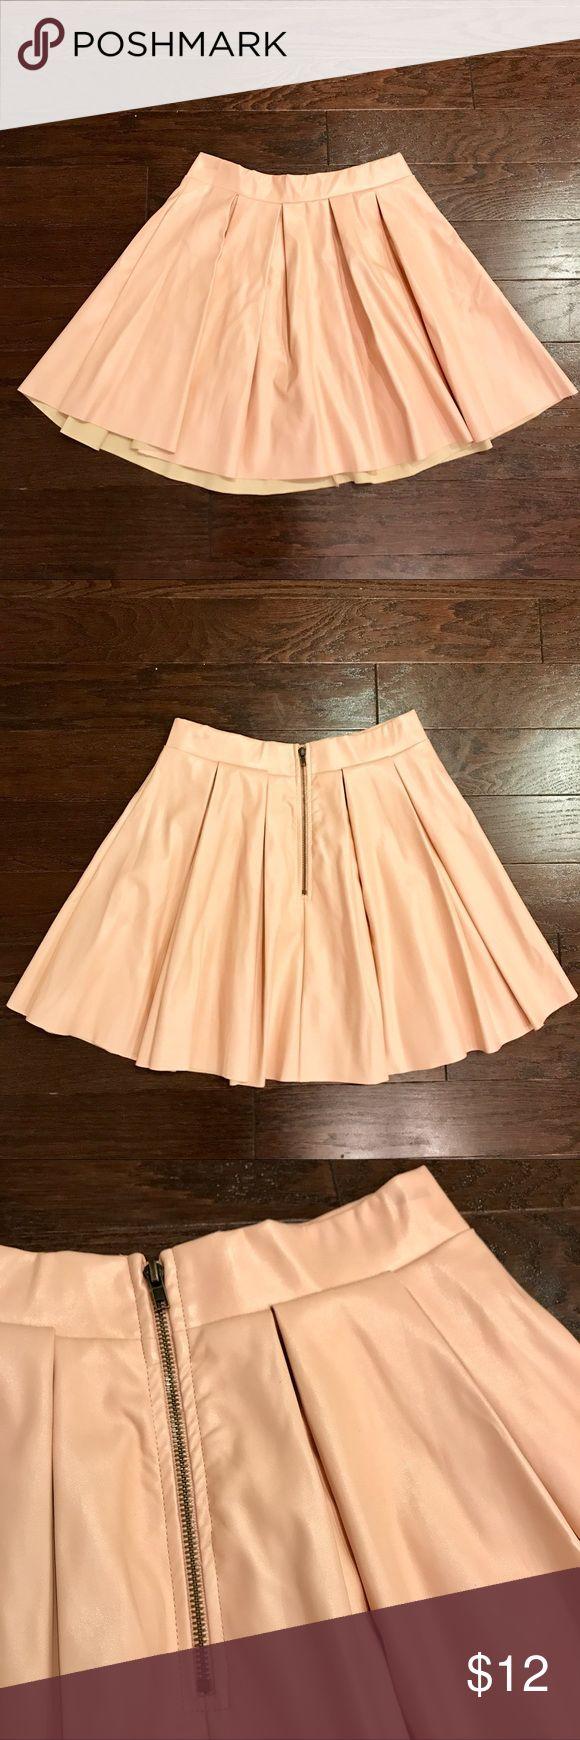 Blush Pink Faux Leather Skater Skirt Faux leather skater skirt in blush pink with exposed back zipper Forever 21 Skirts Circle & Skater